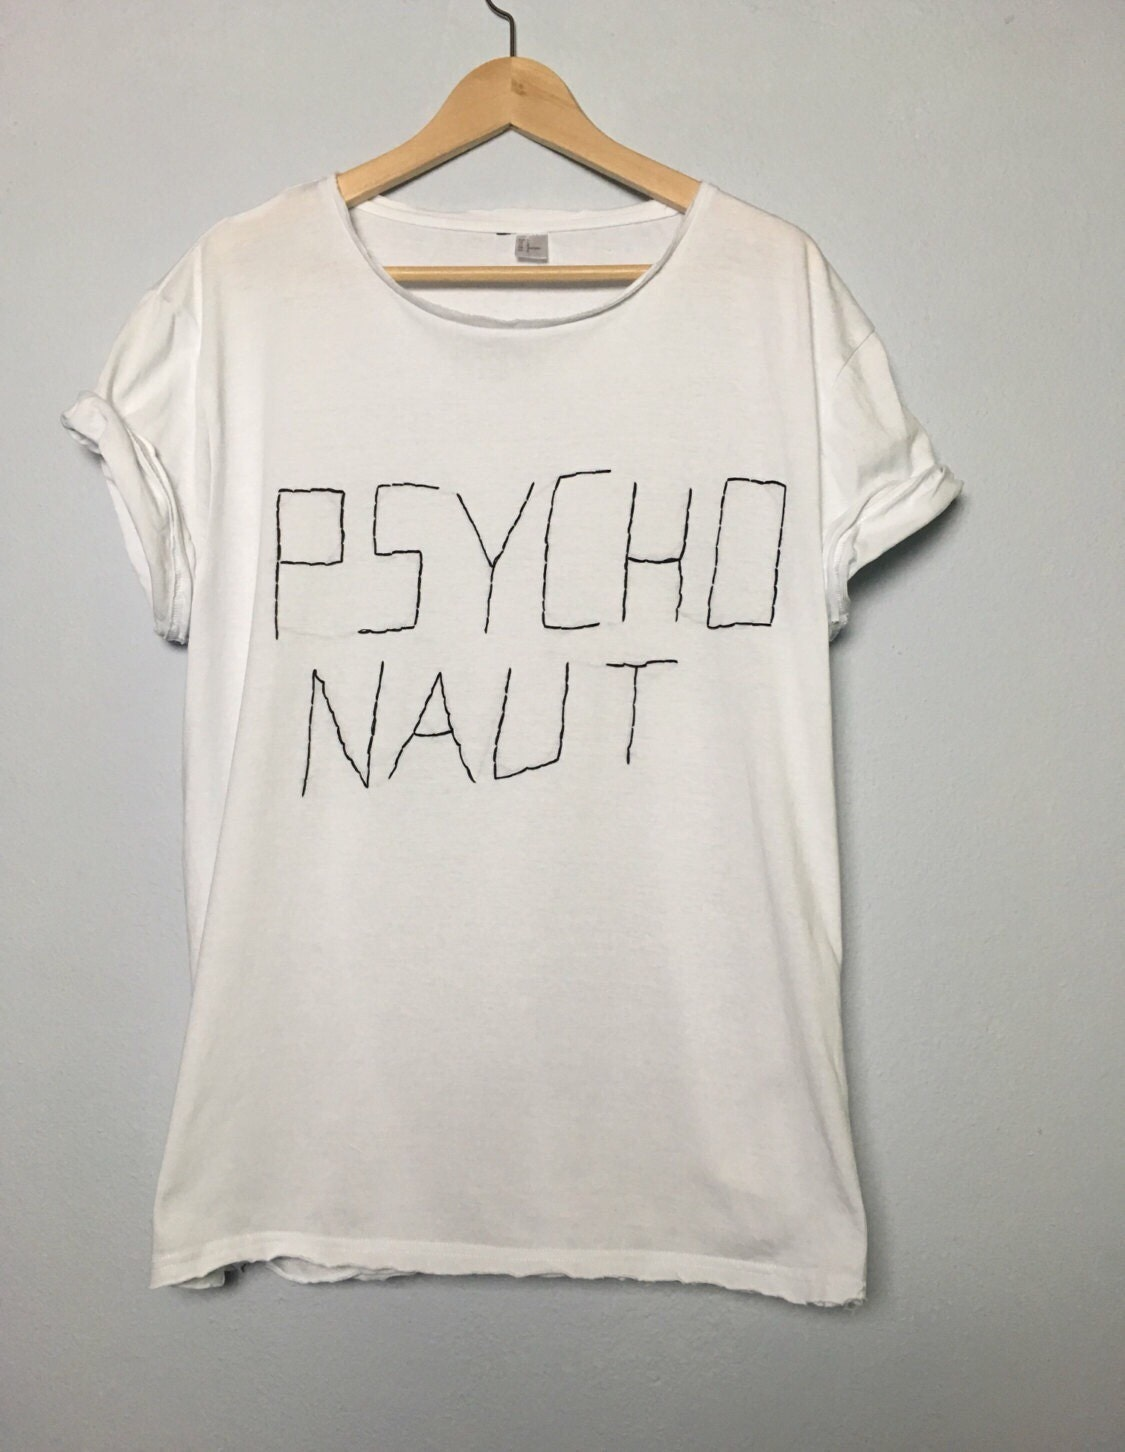 Psychonaut (Tshirt bestickt) OWMGmYC4mp